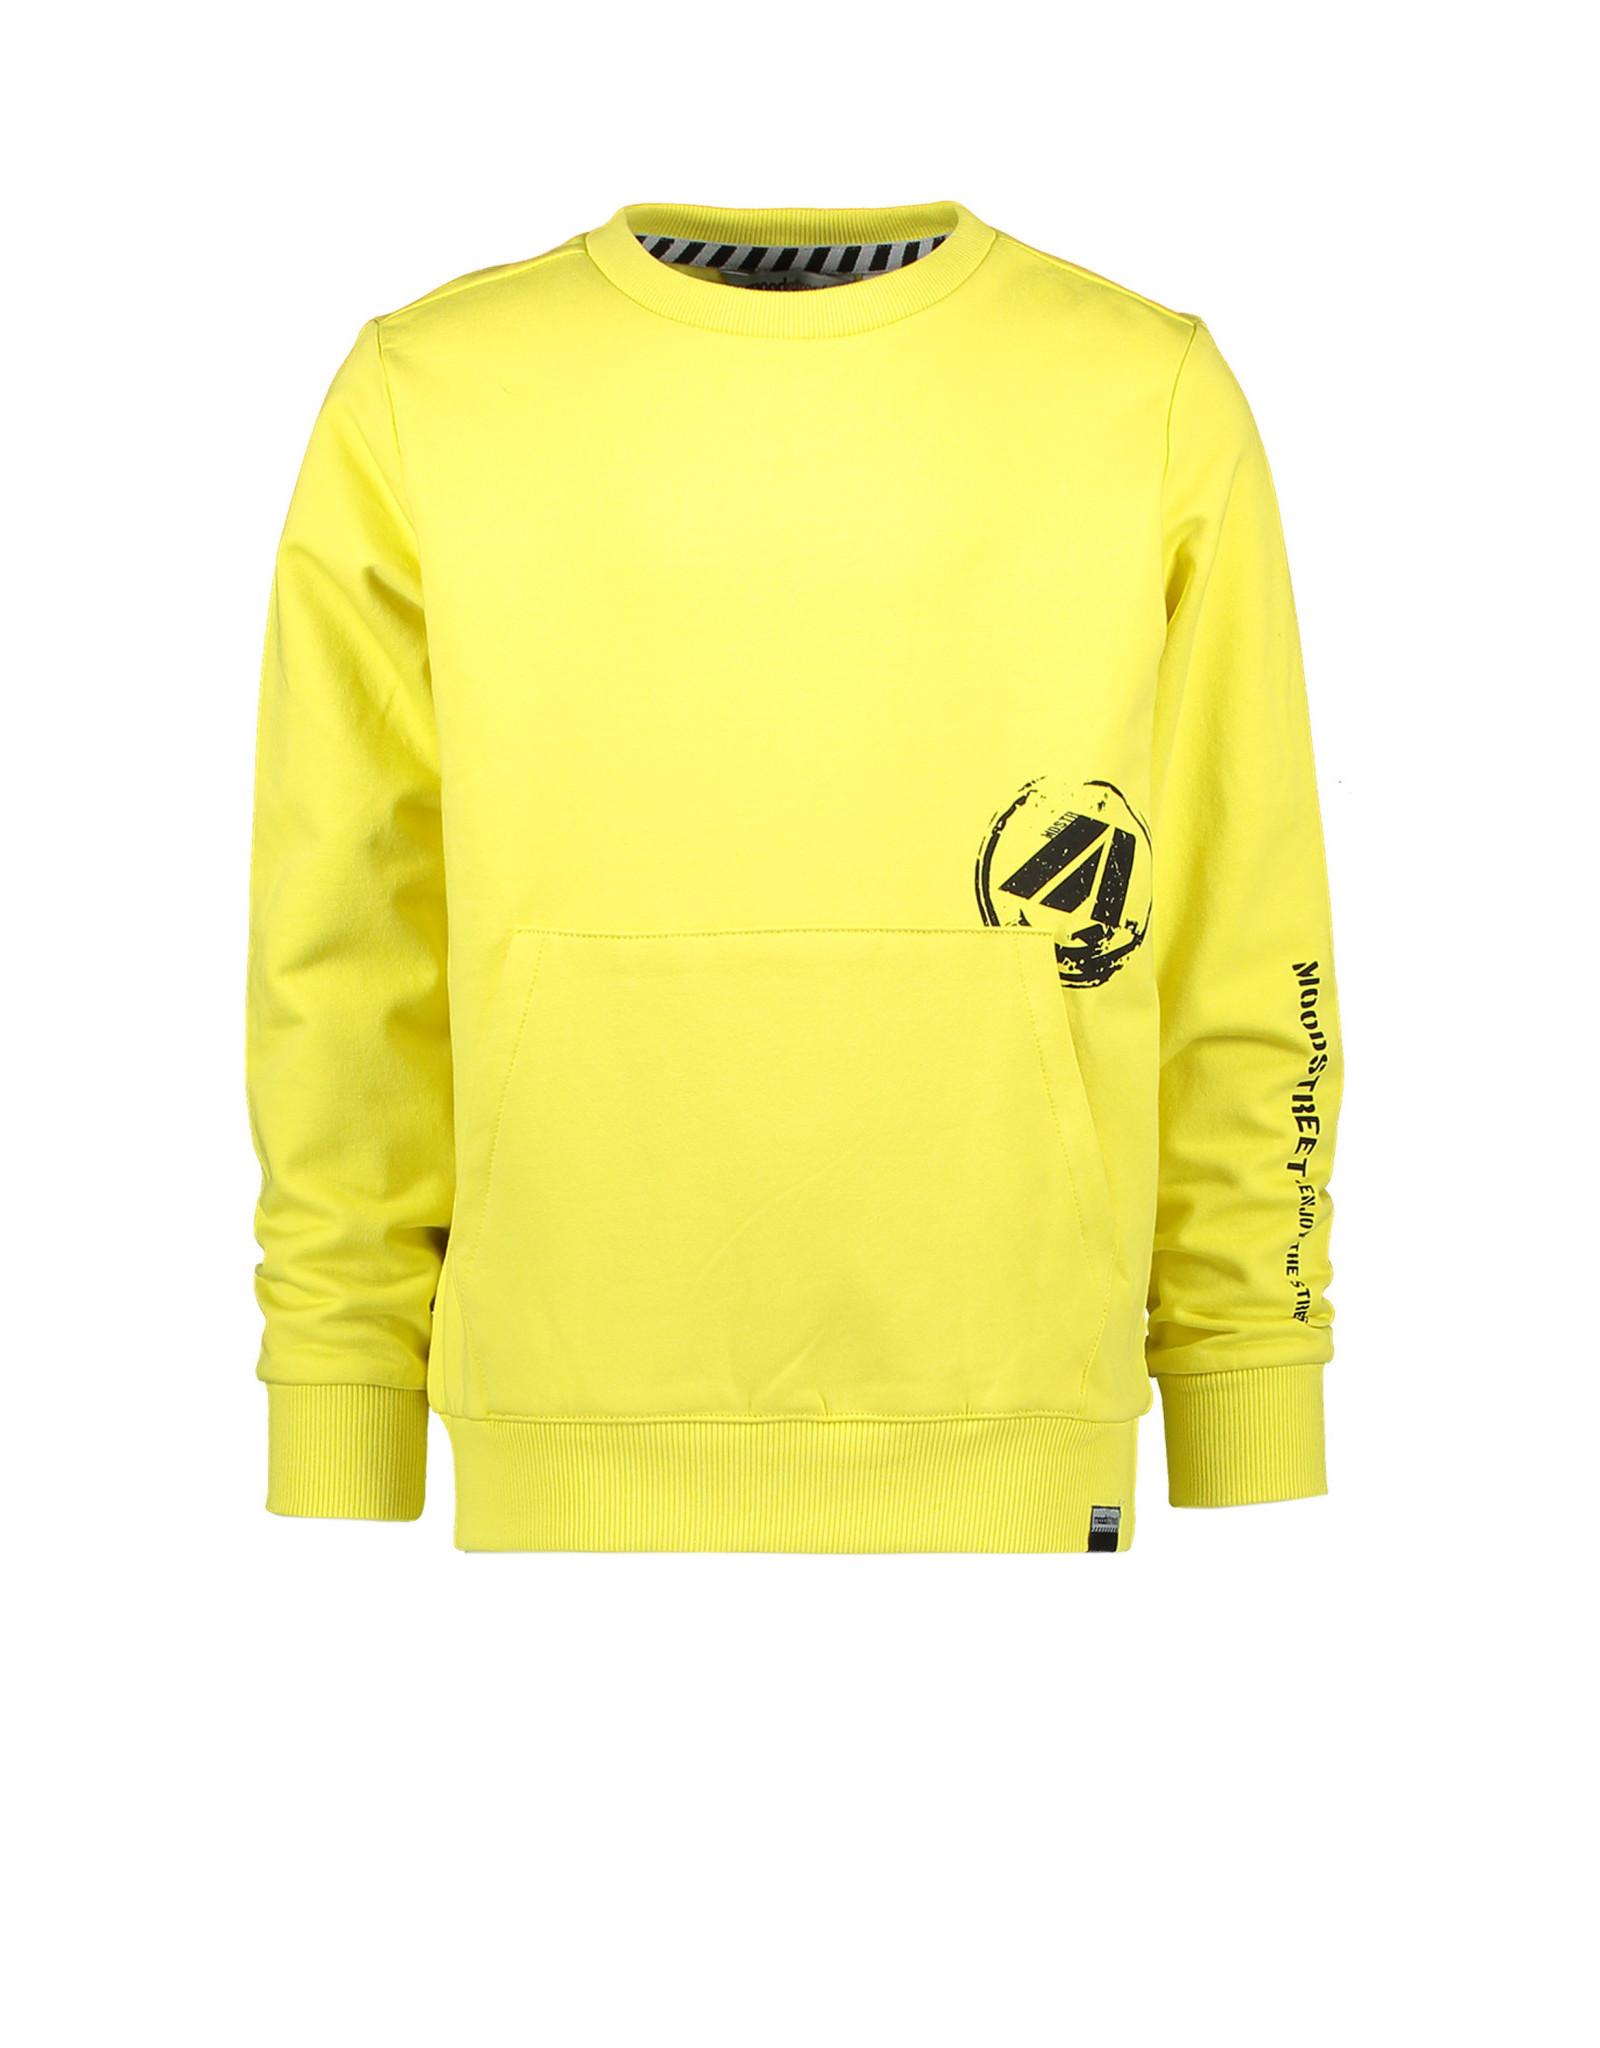 Moodstreet Moodstreet jongens sweater Washed Yellow